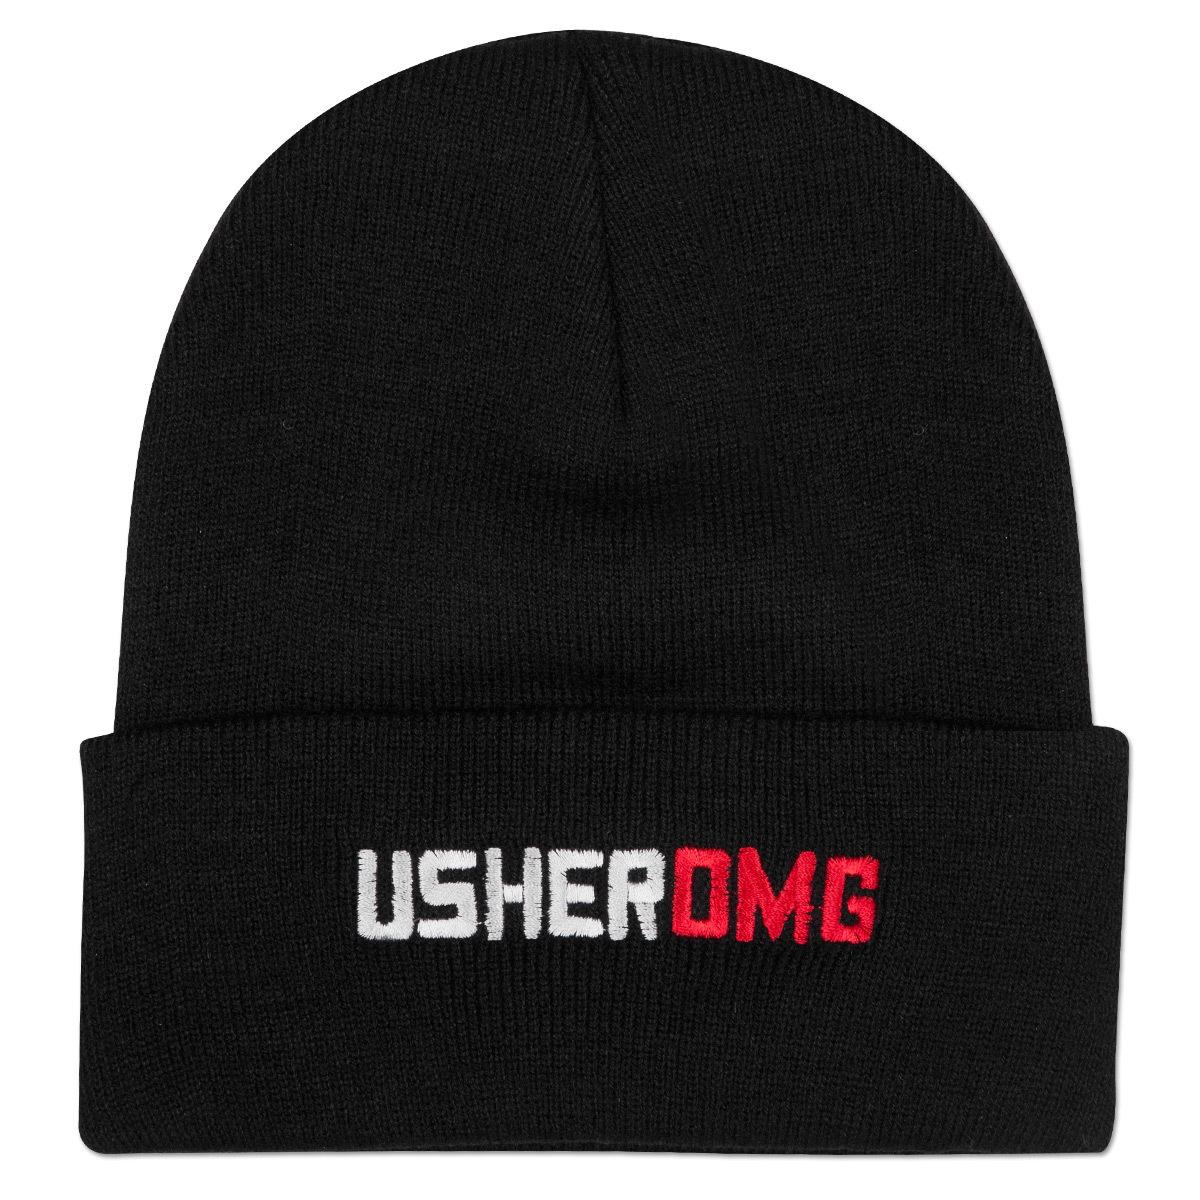 Usher OMG Tour Beanie